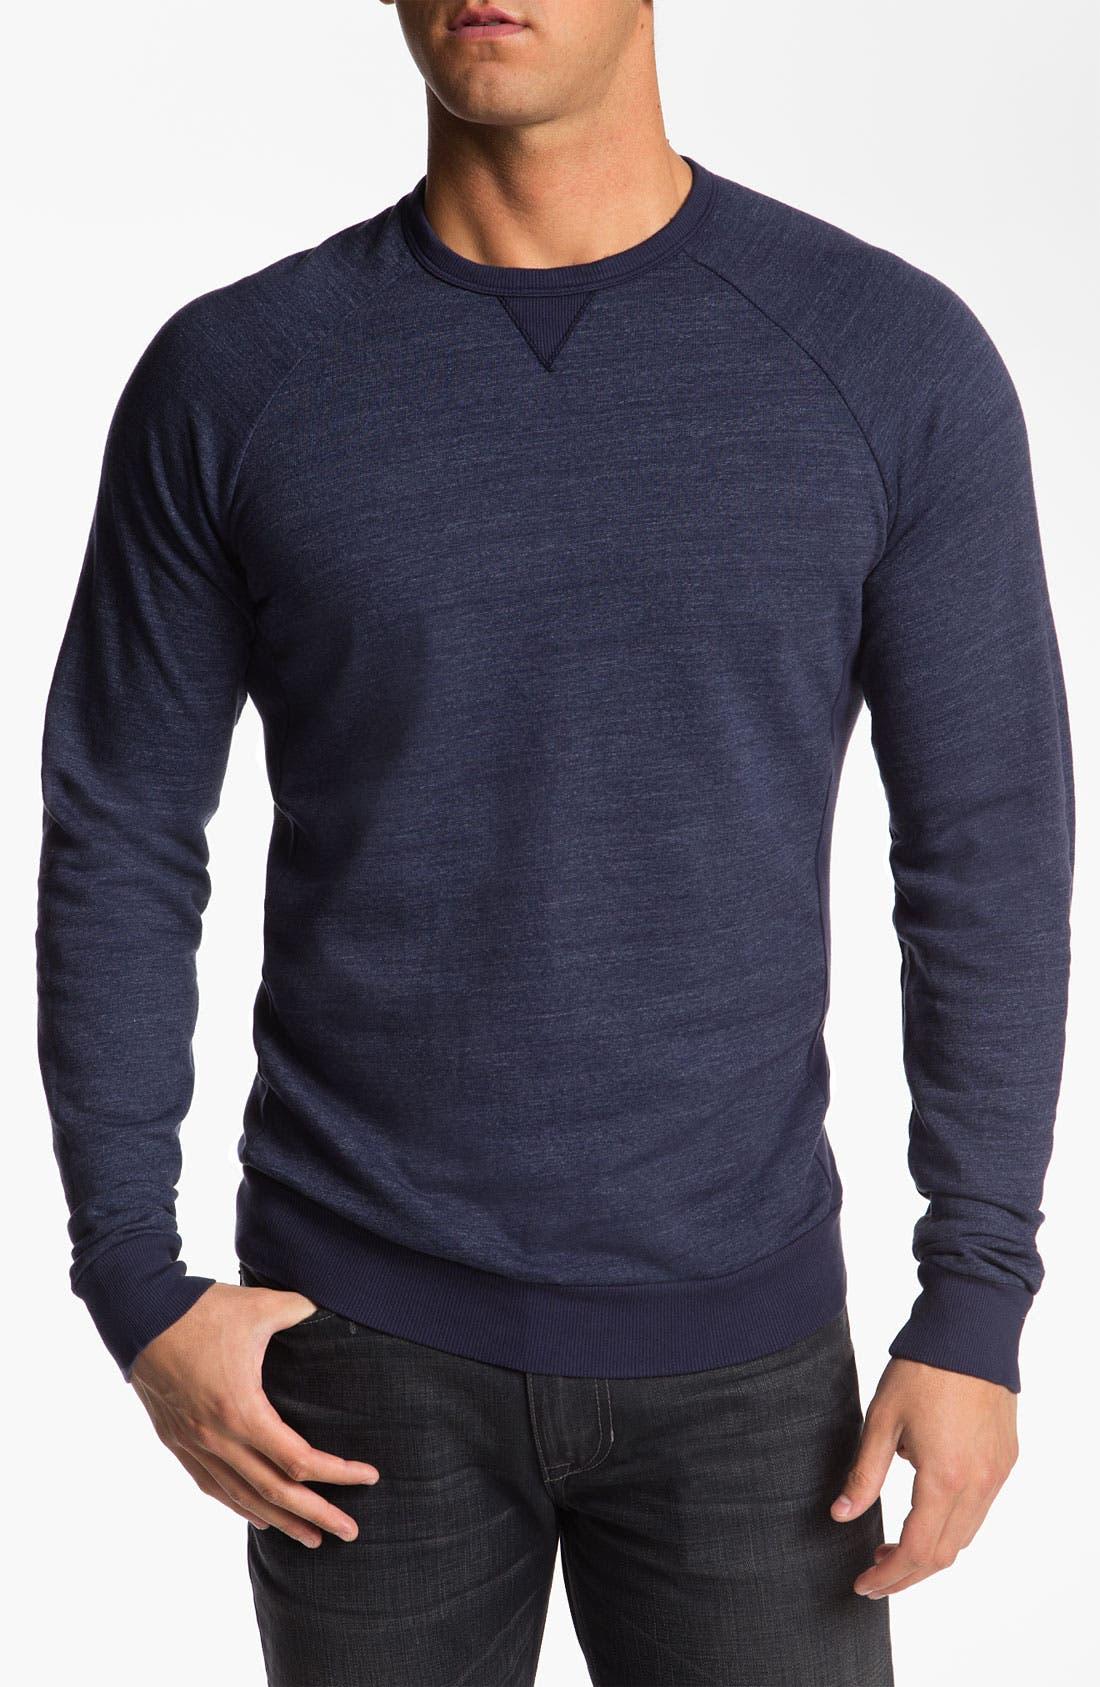 Main Image - Splendid Mills 'Brody' Crewneck Sweatshirt